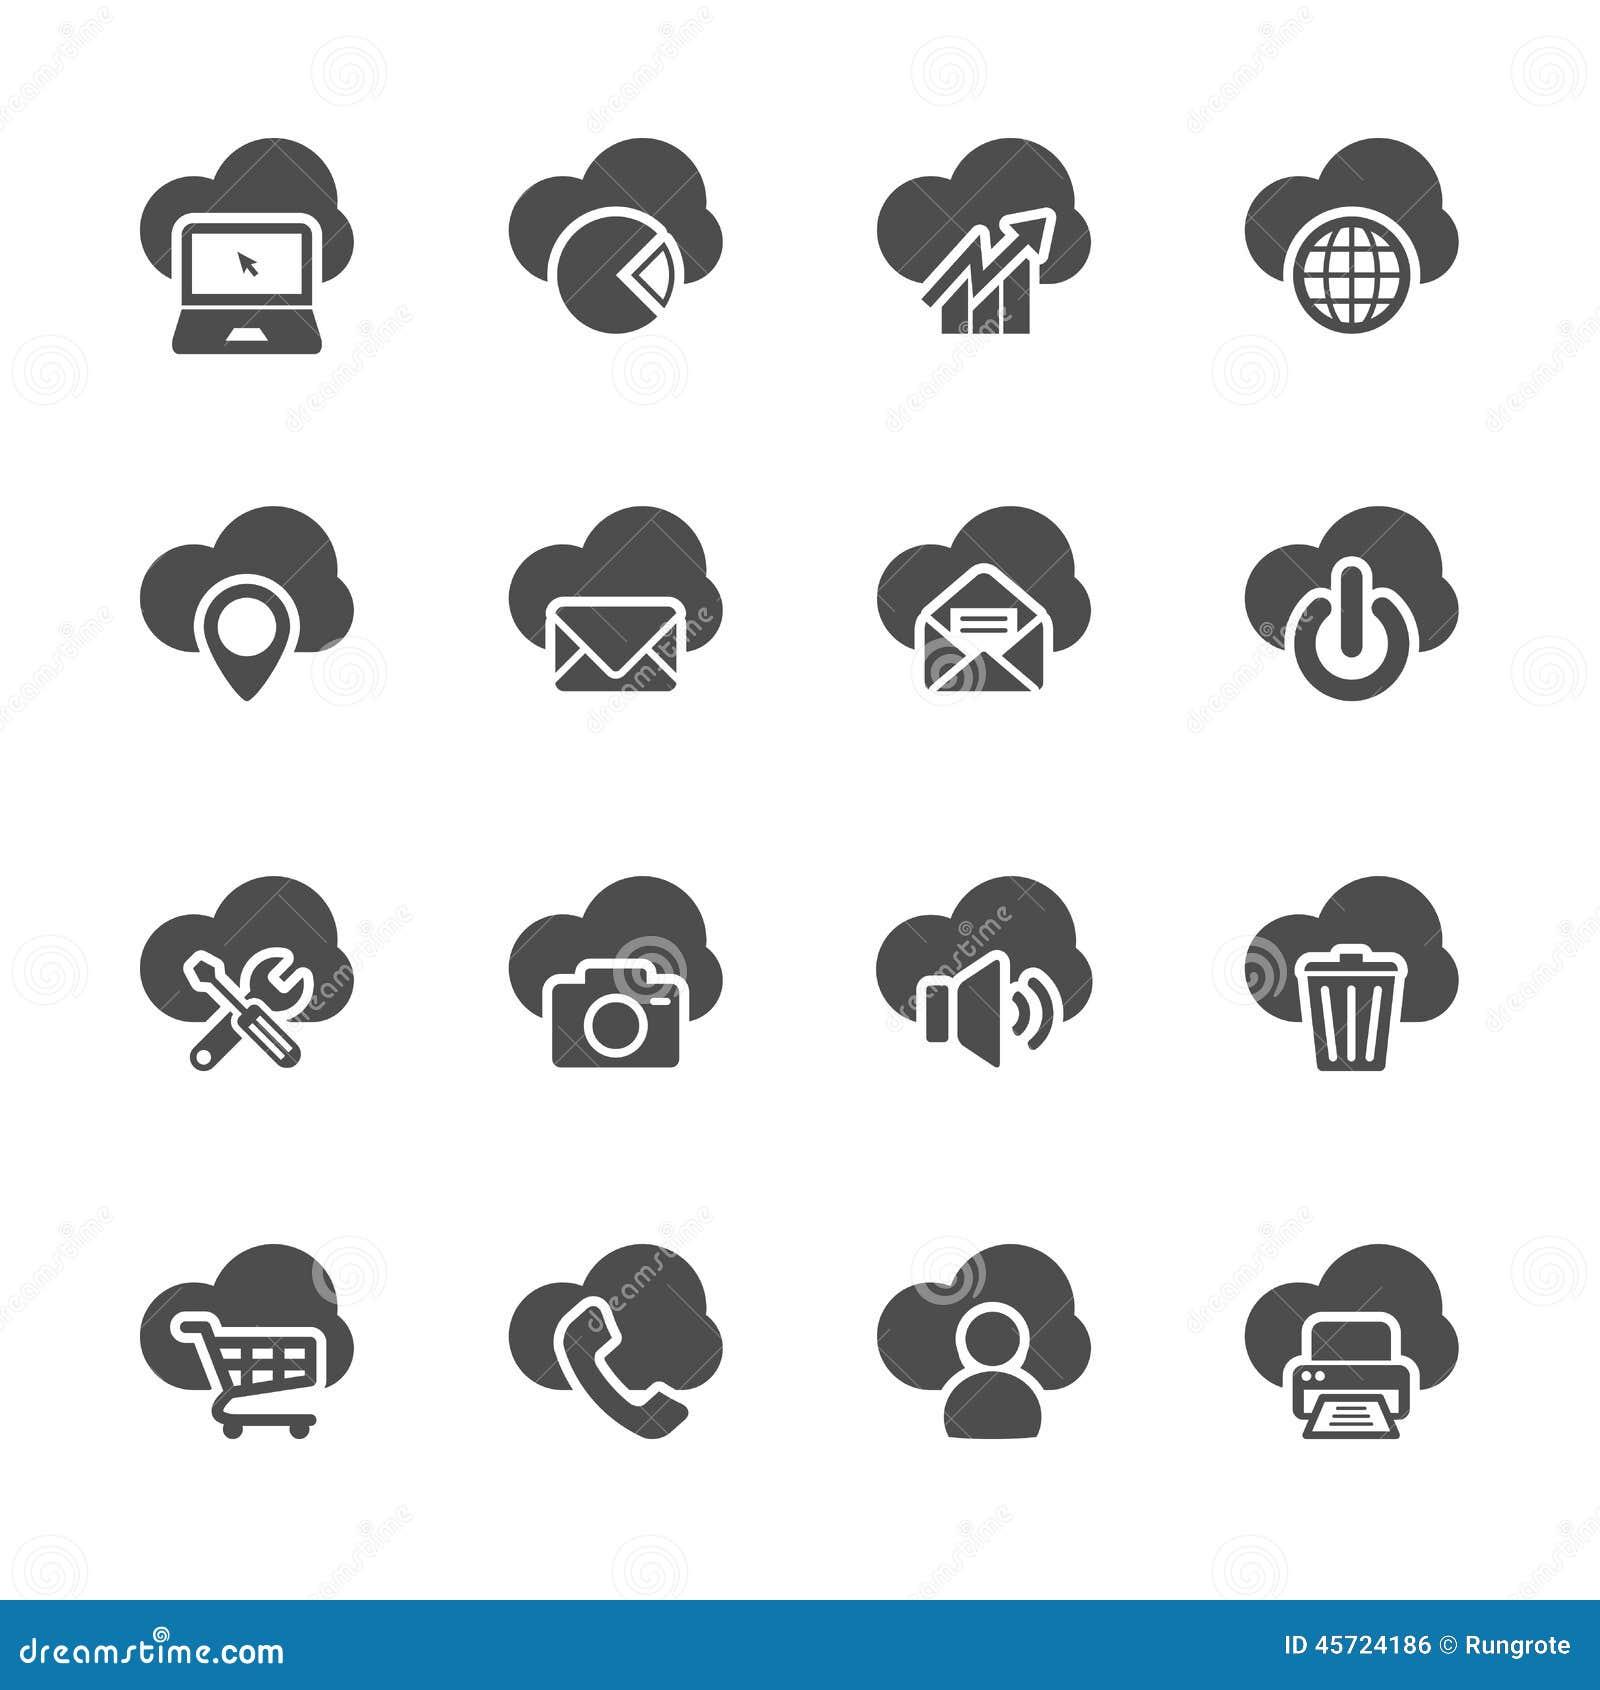 cloud computing icon vector illustration